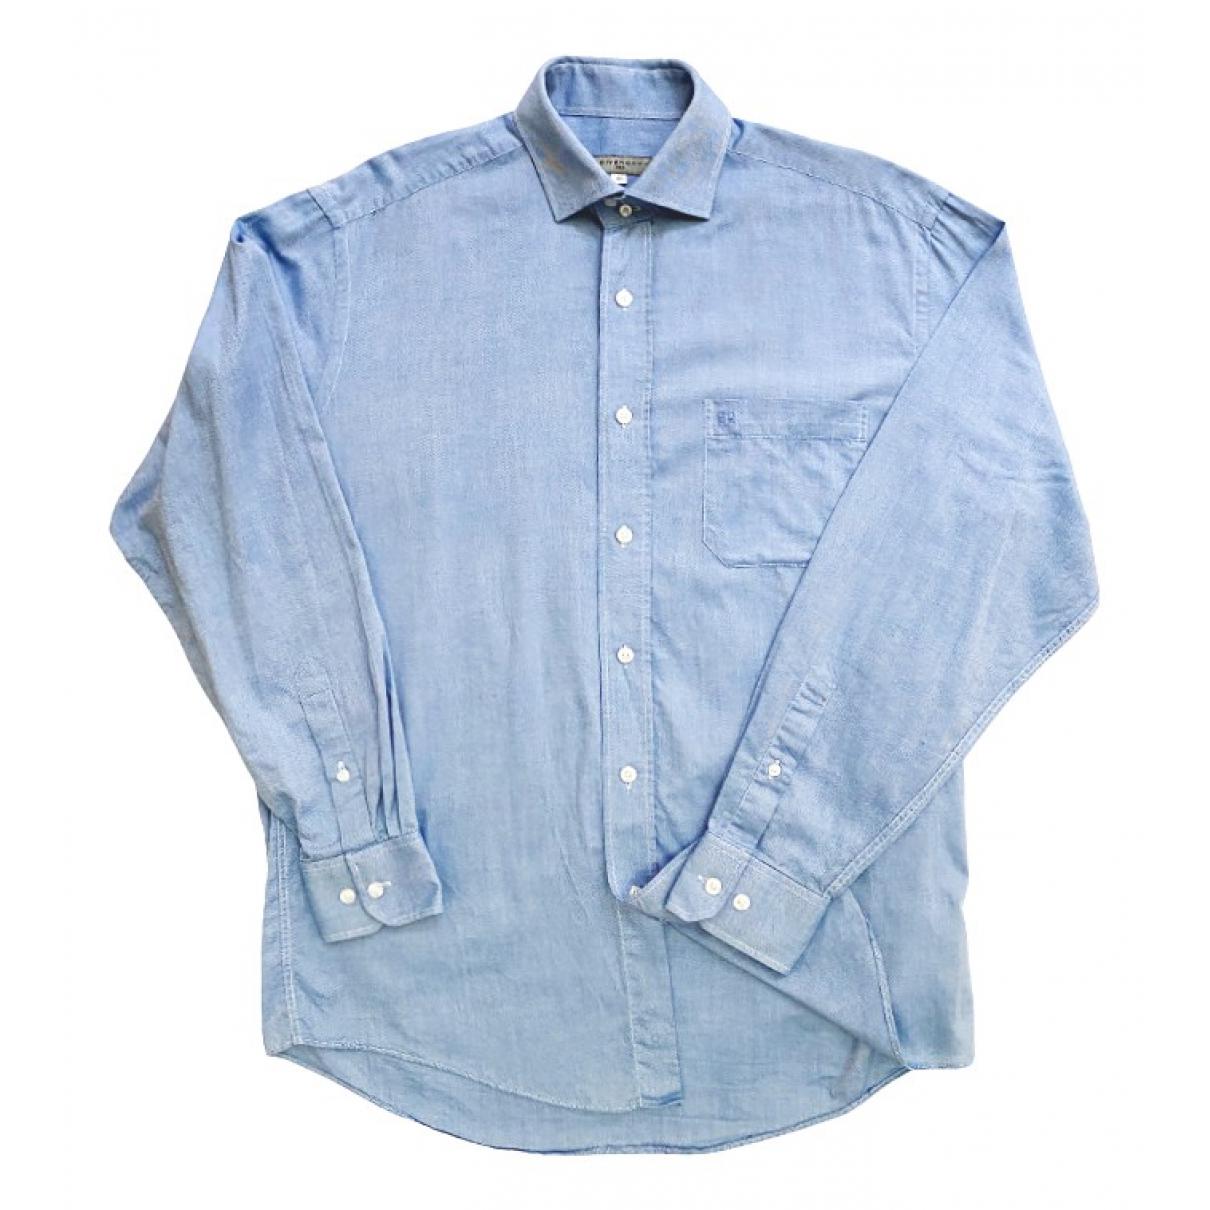 Givenchy \N Blue Cotton Shirts for Men 41 EU (tour de cou / collar)